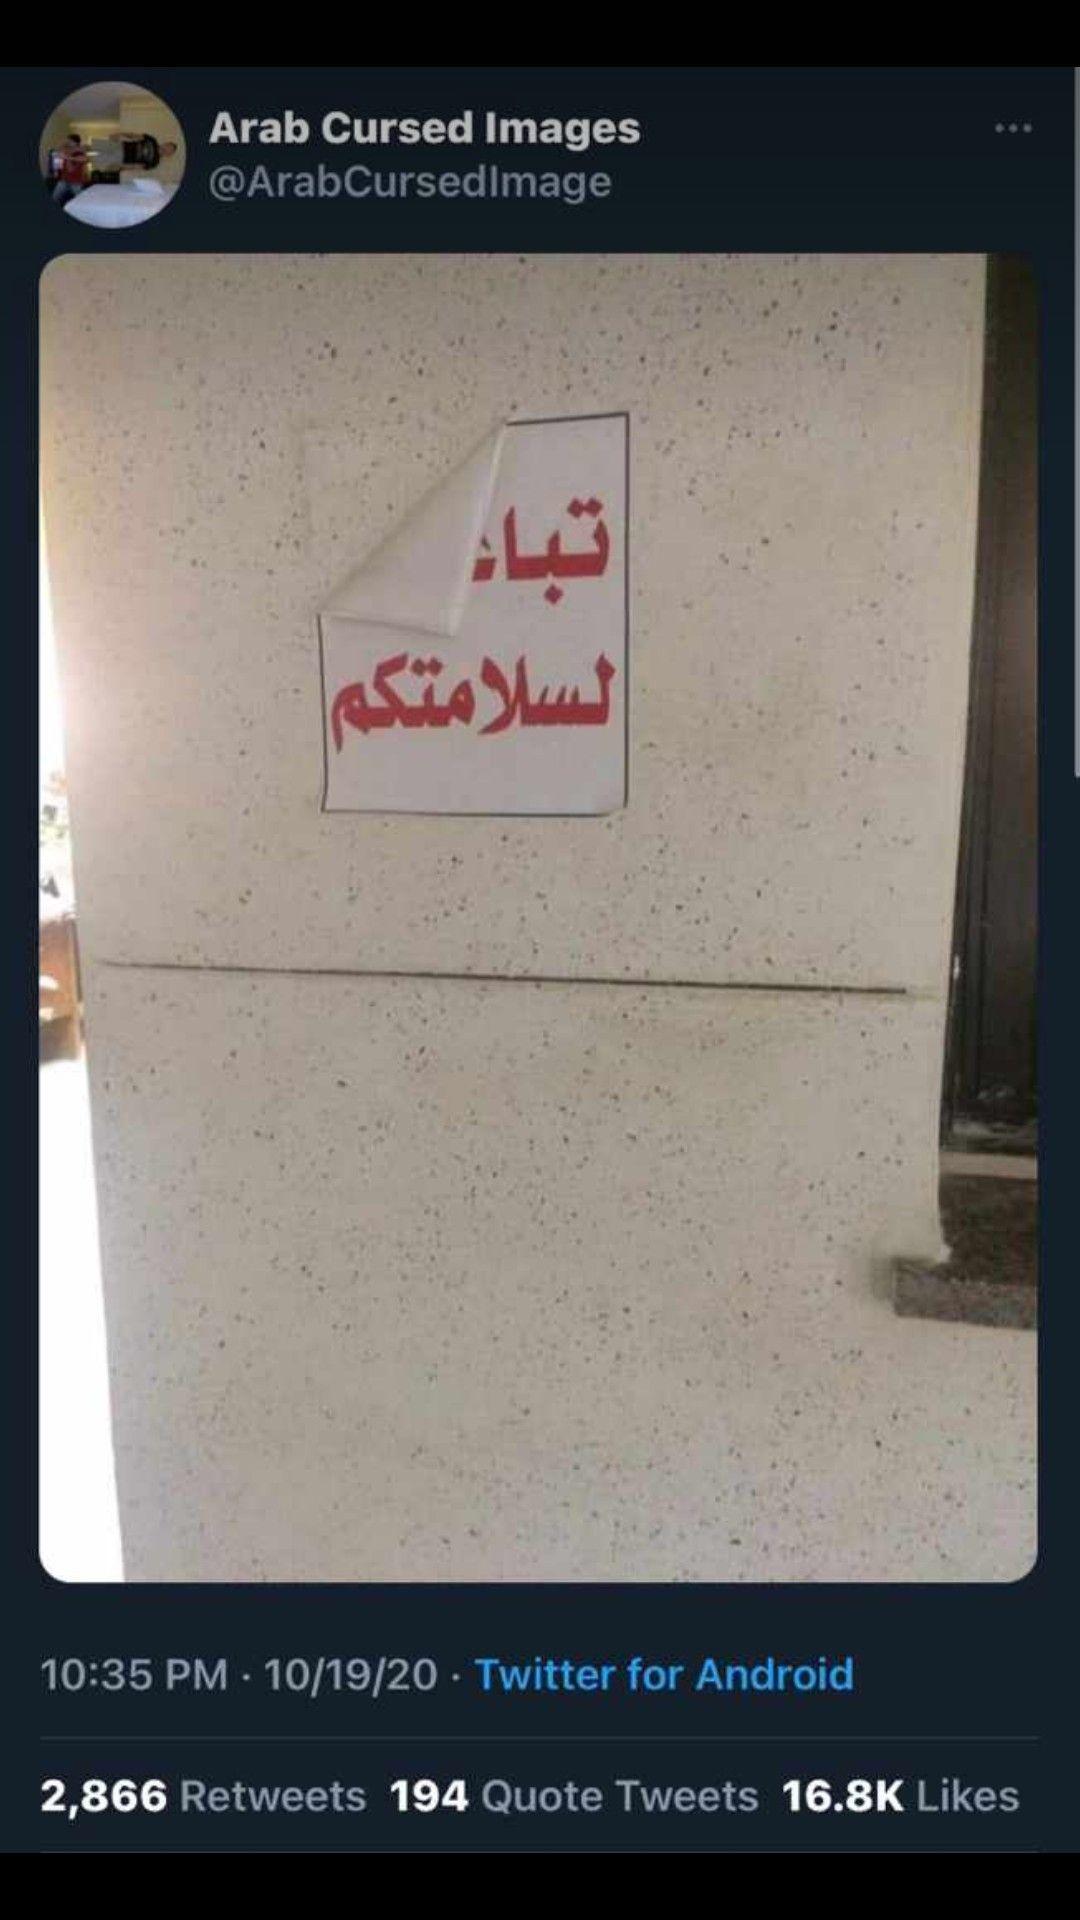 Pin By Jojo On استهبال Arabic Funny Arabic Memes Tweet Quotes